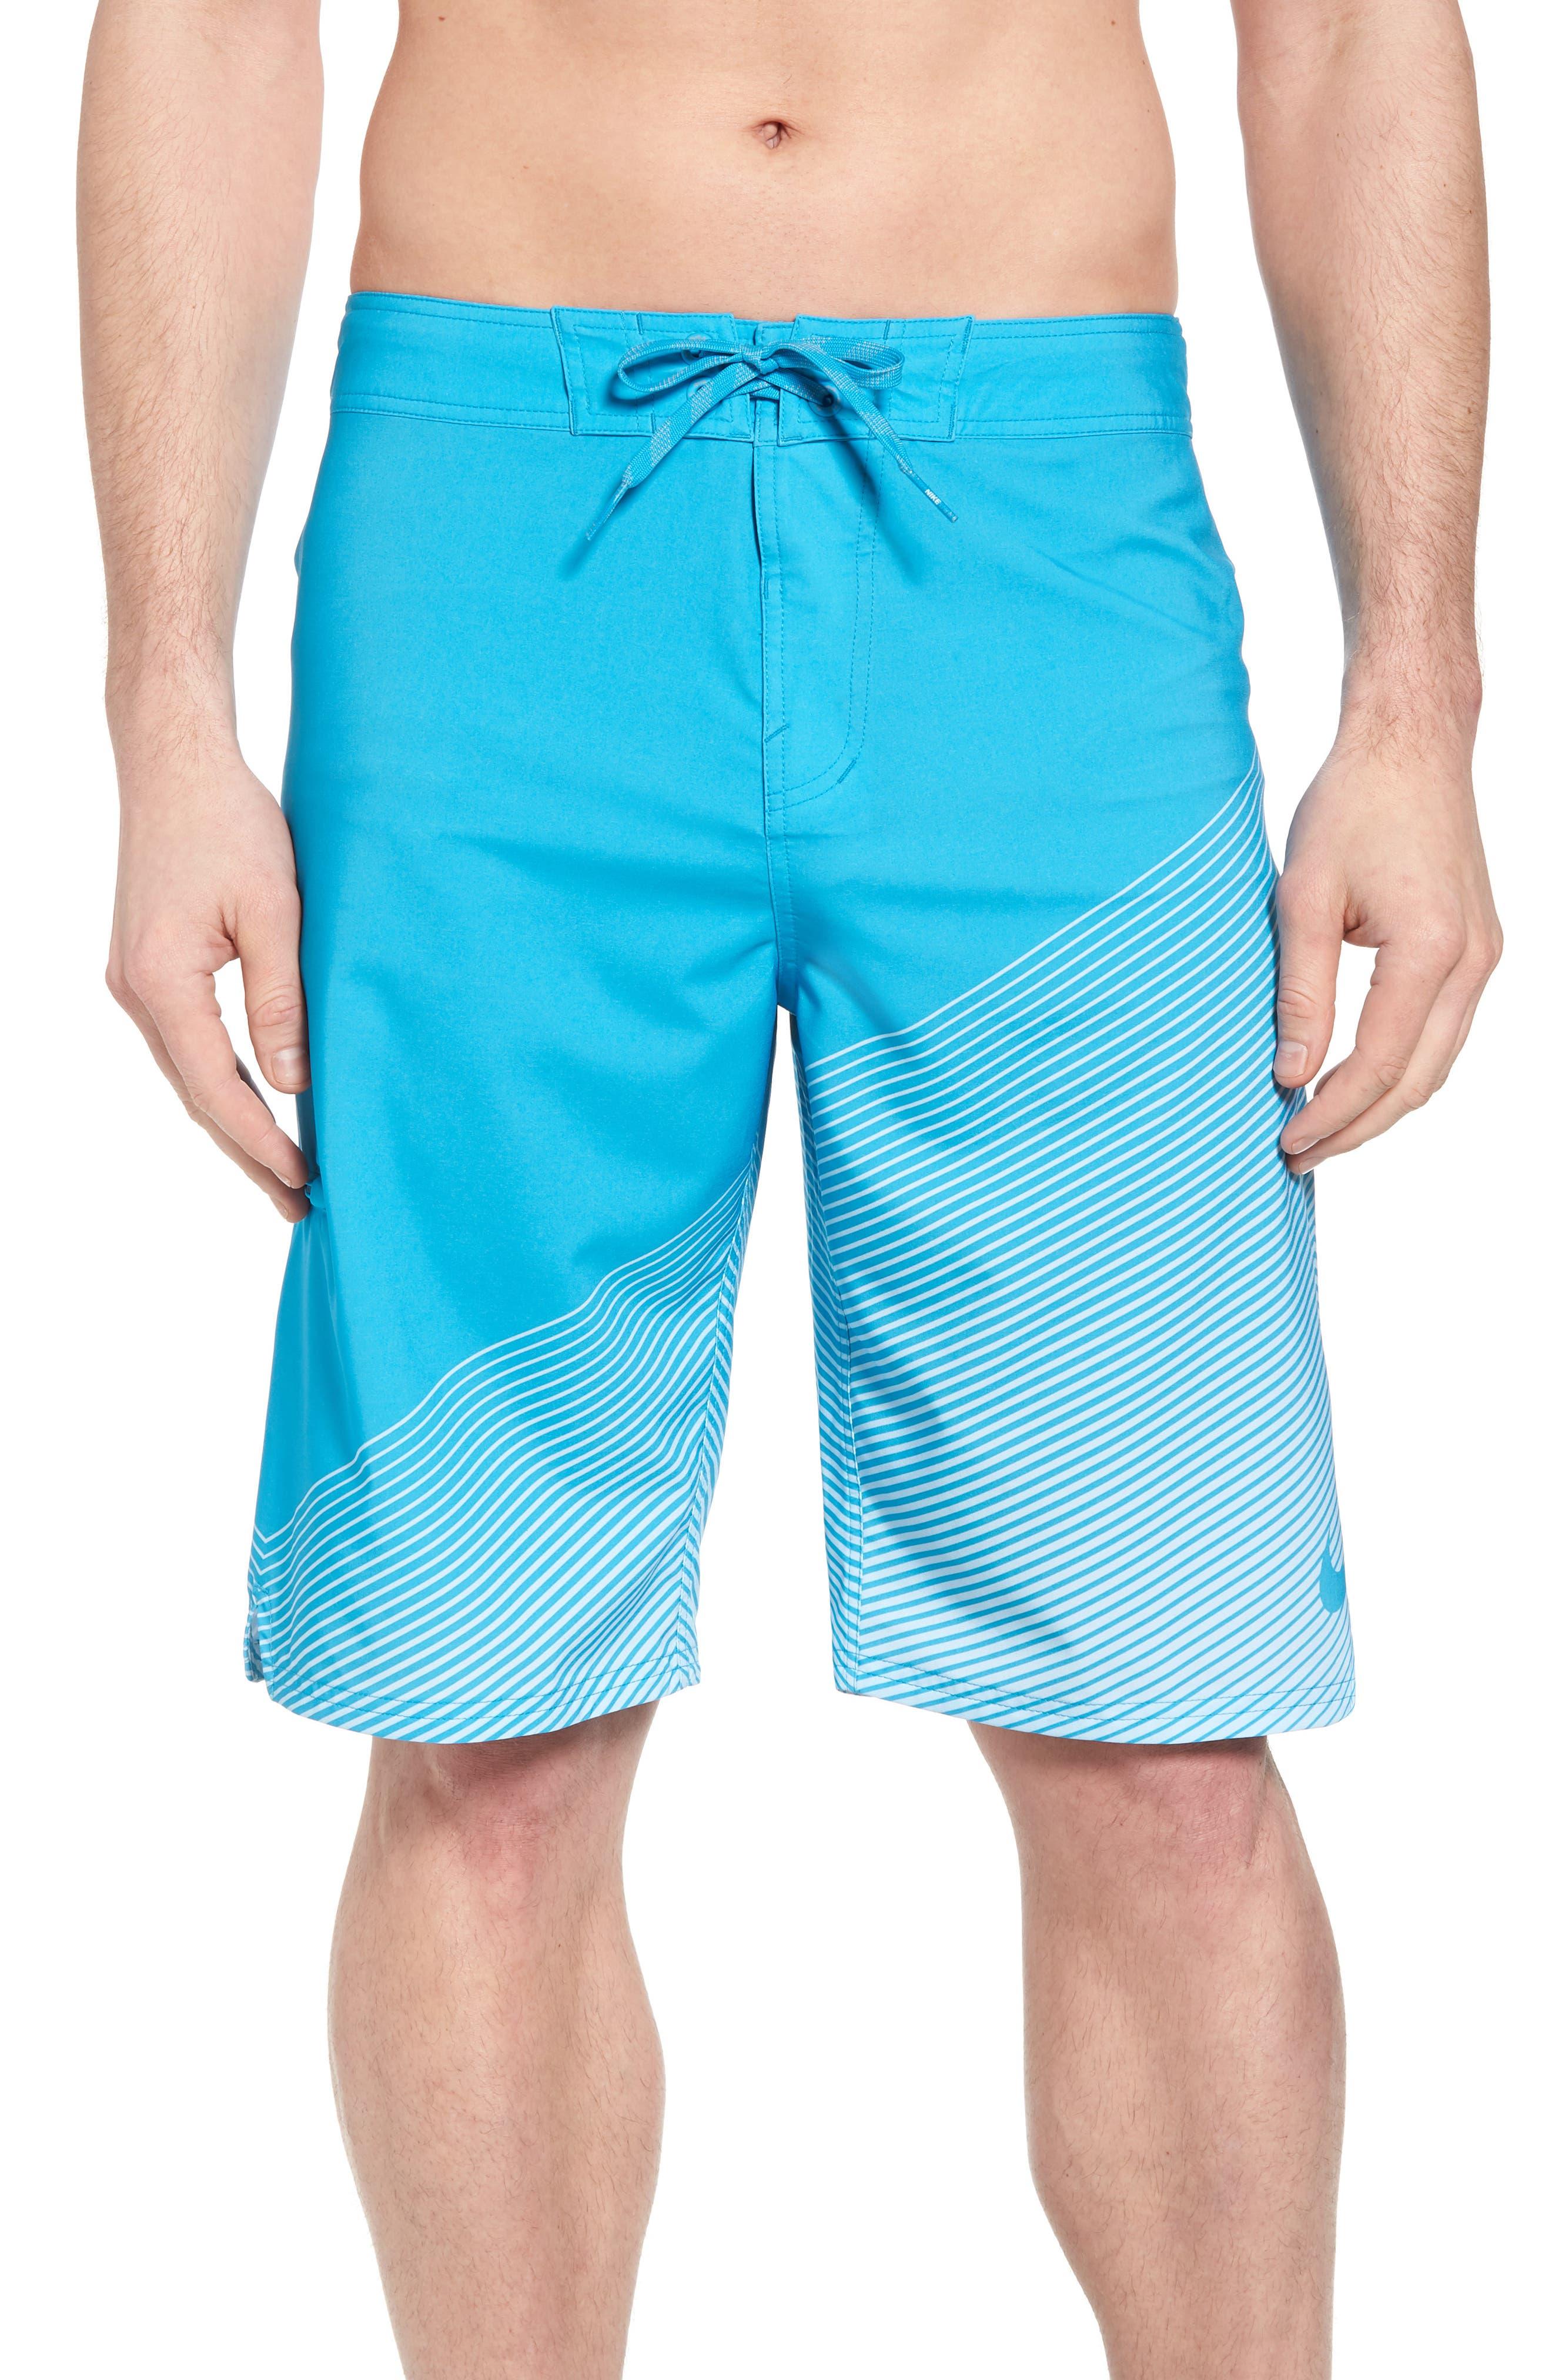 Jackknife Board Shorts,                         Main,                         color, Lt Blue Fury